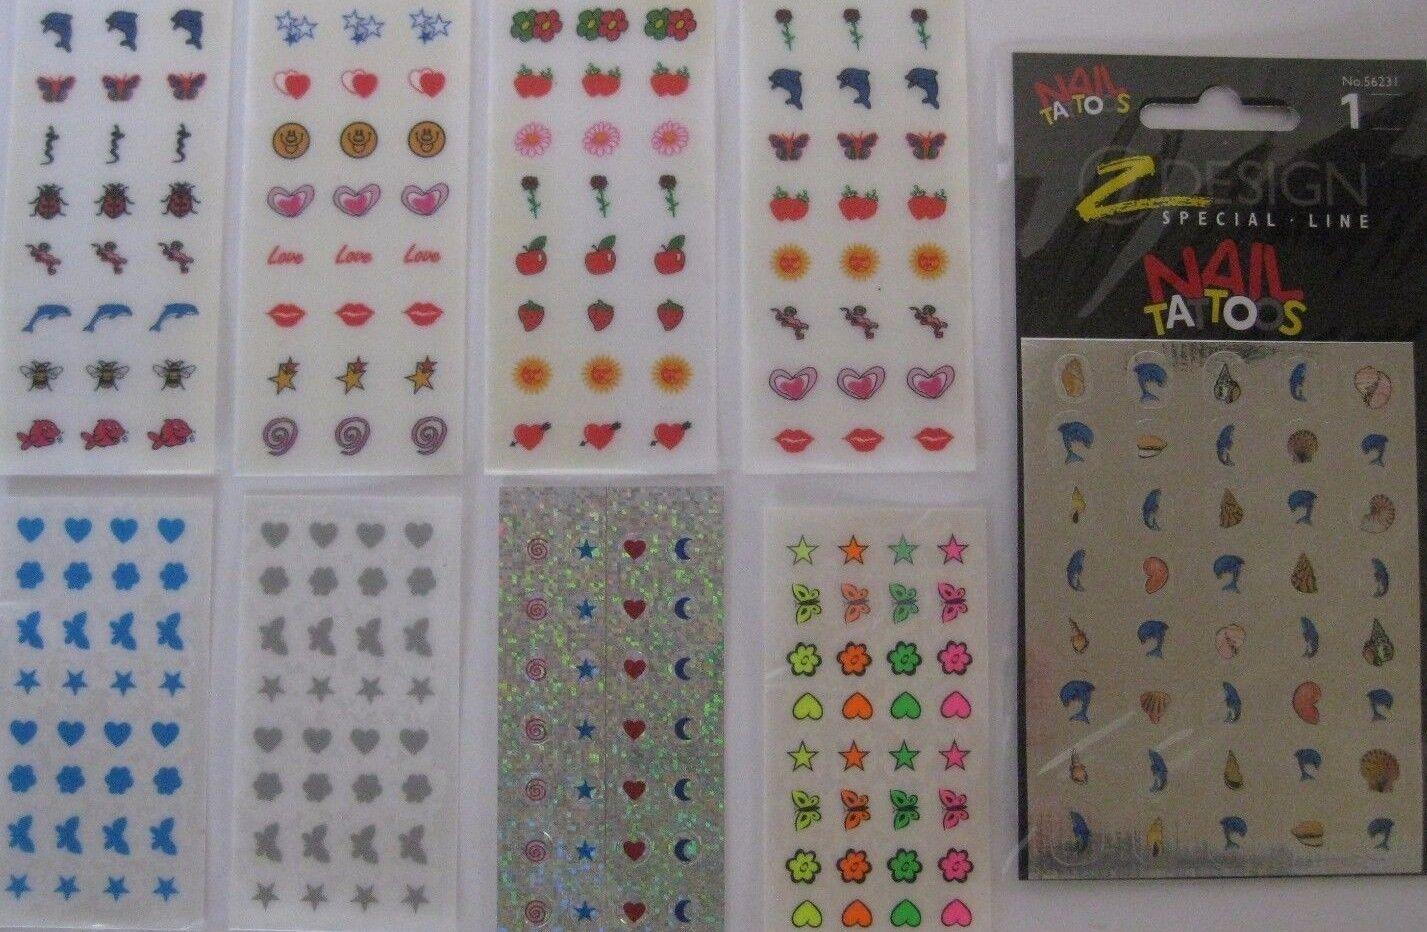 Nail Stickers Nagel Aufkleber Fingernägel Tattoo Glitzer Neon Tiere Blumen Stern